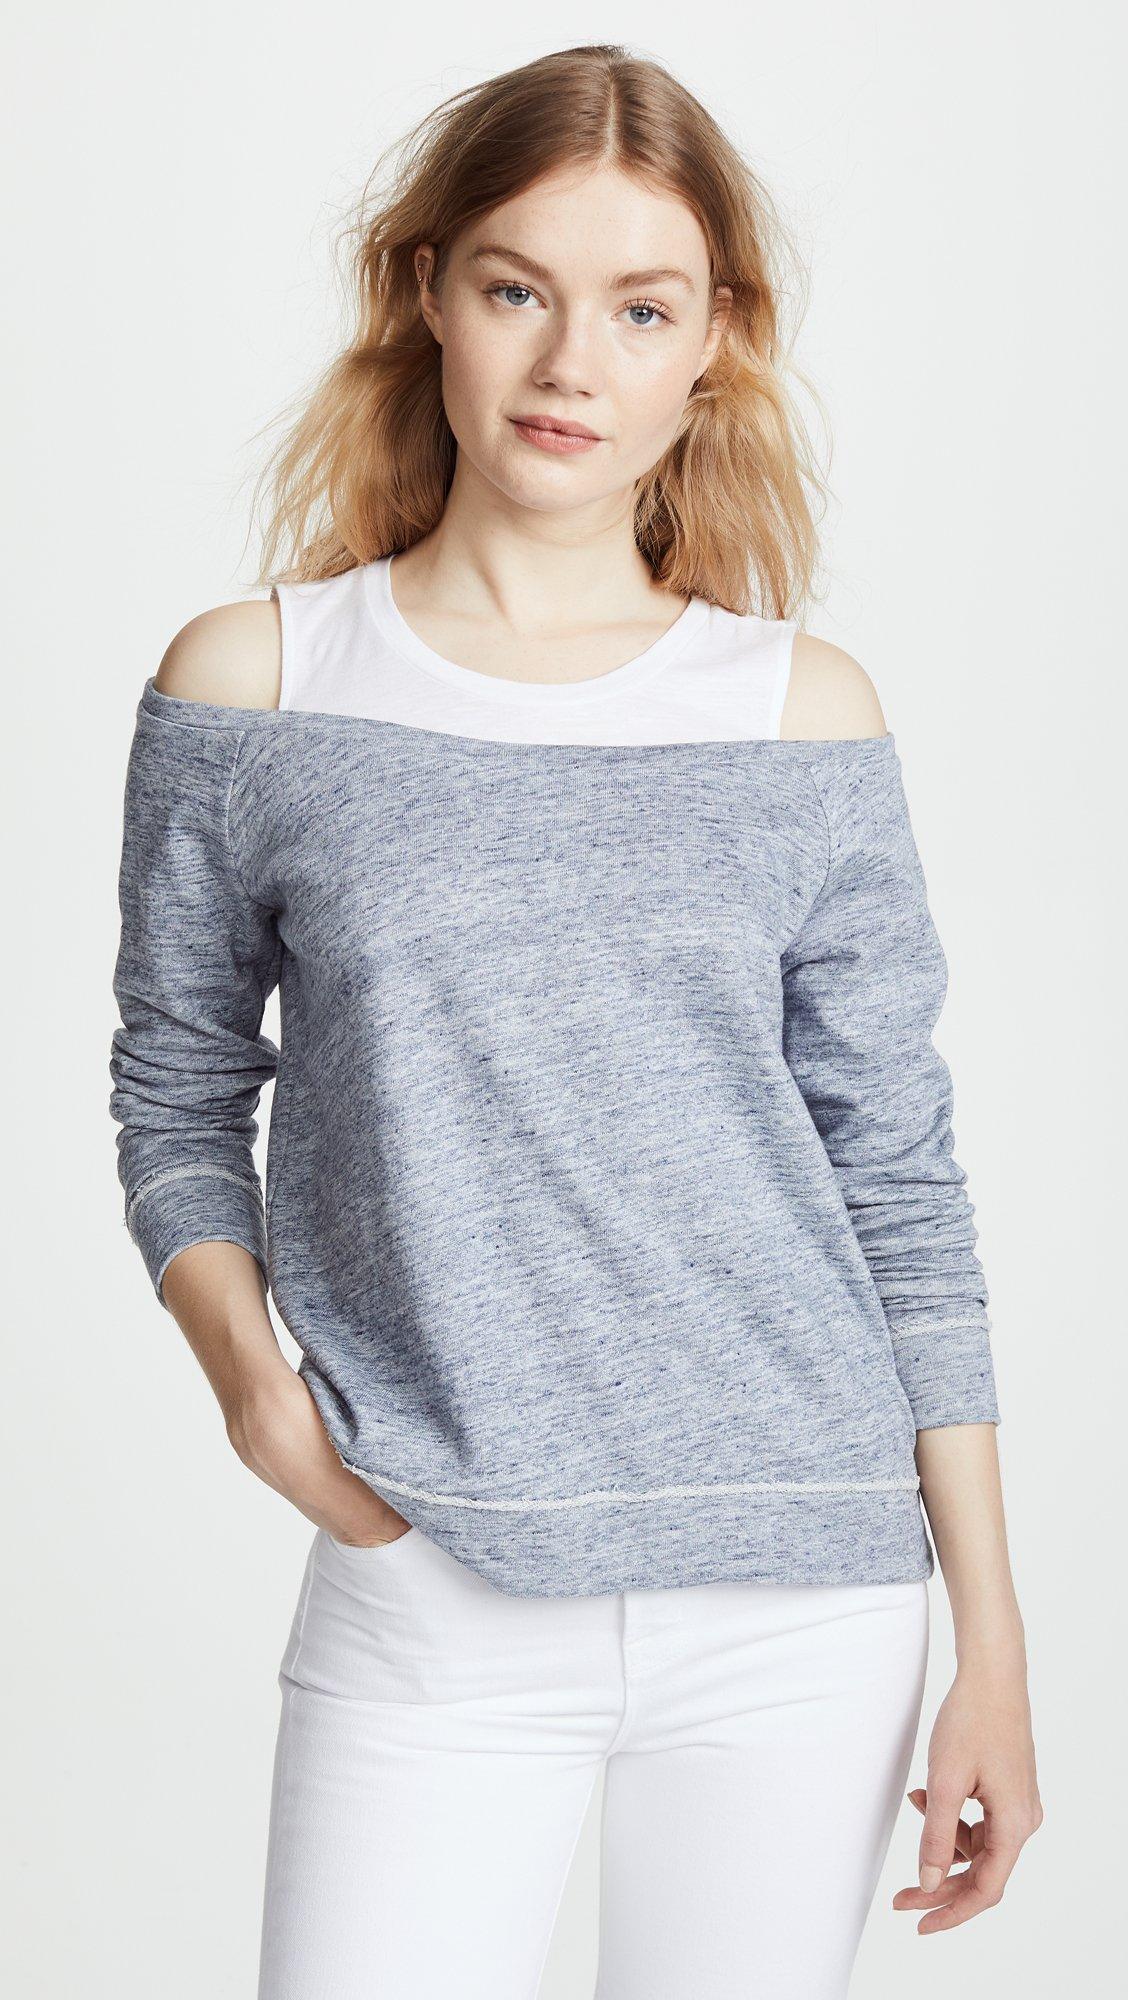 Generation Love Women's Roni Double Layered Sweatshirt, Heather Blue, Small by Generation Love (Image #2)